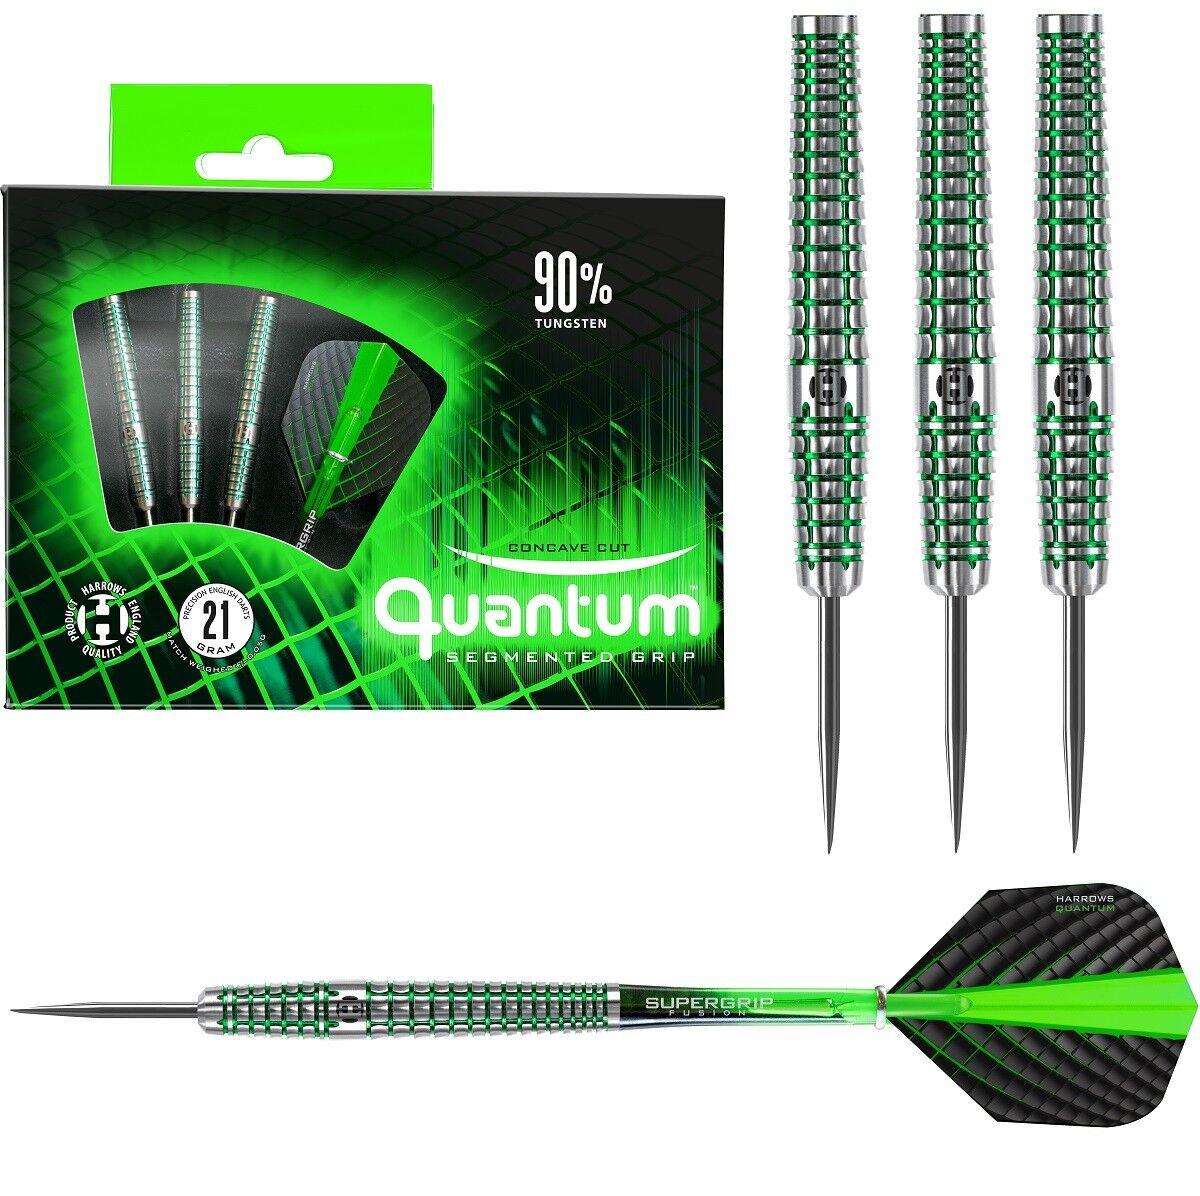 Harrows Quantum 90% Tungsten Steel Tip Darts - Green Rings - 22g 23g 24g or 26g